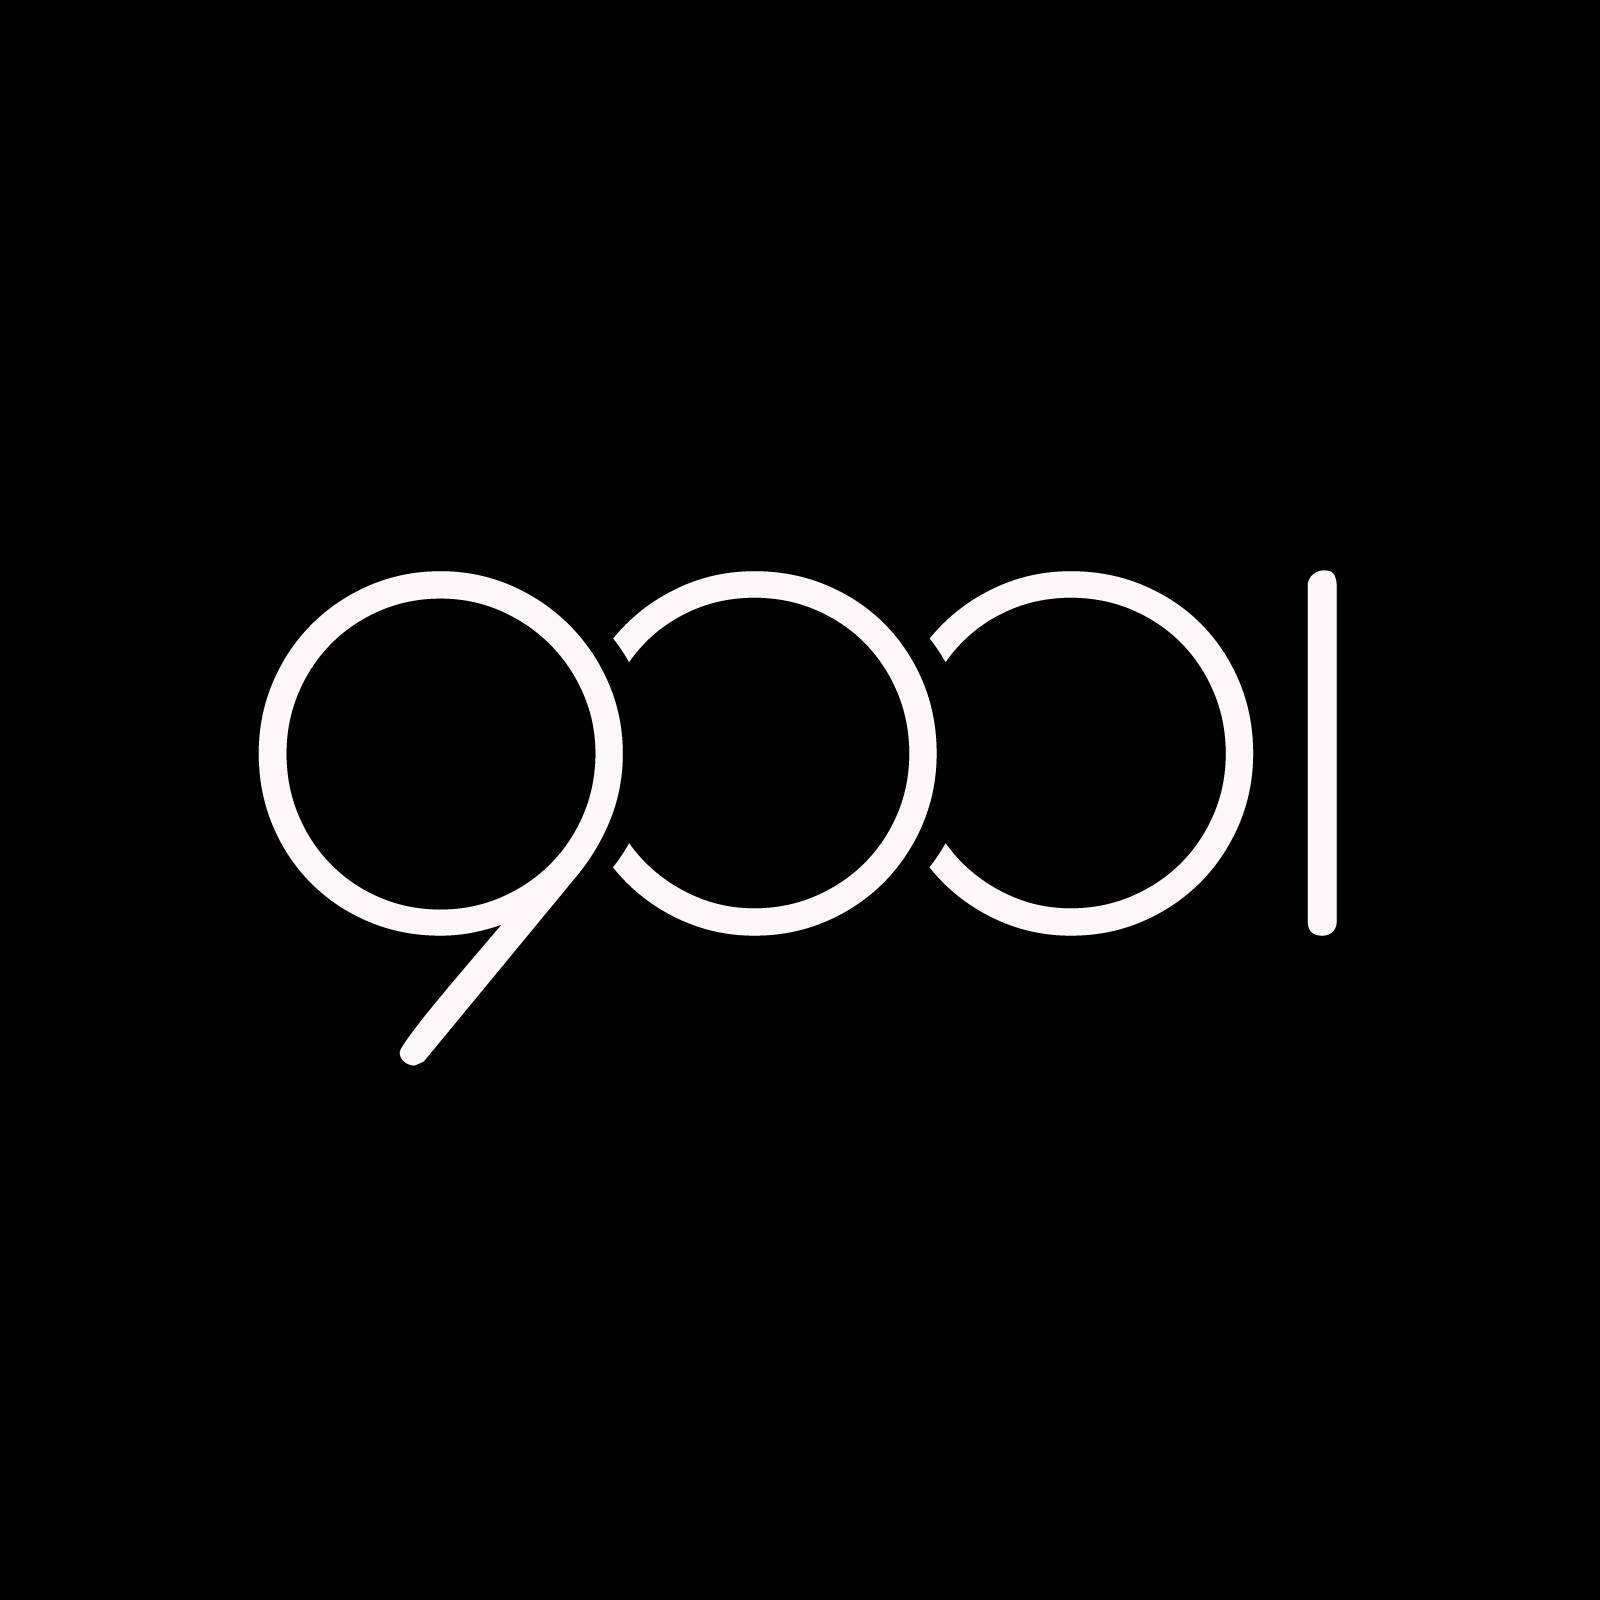 9001_Productions.jpg